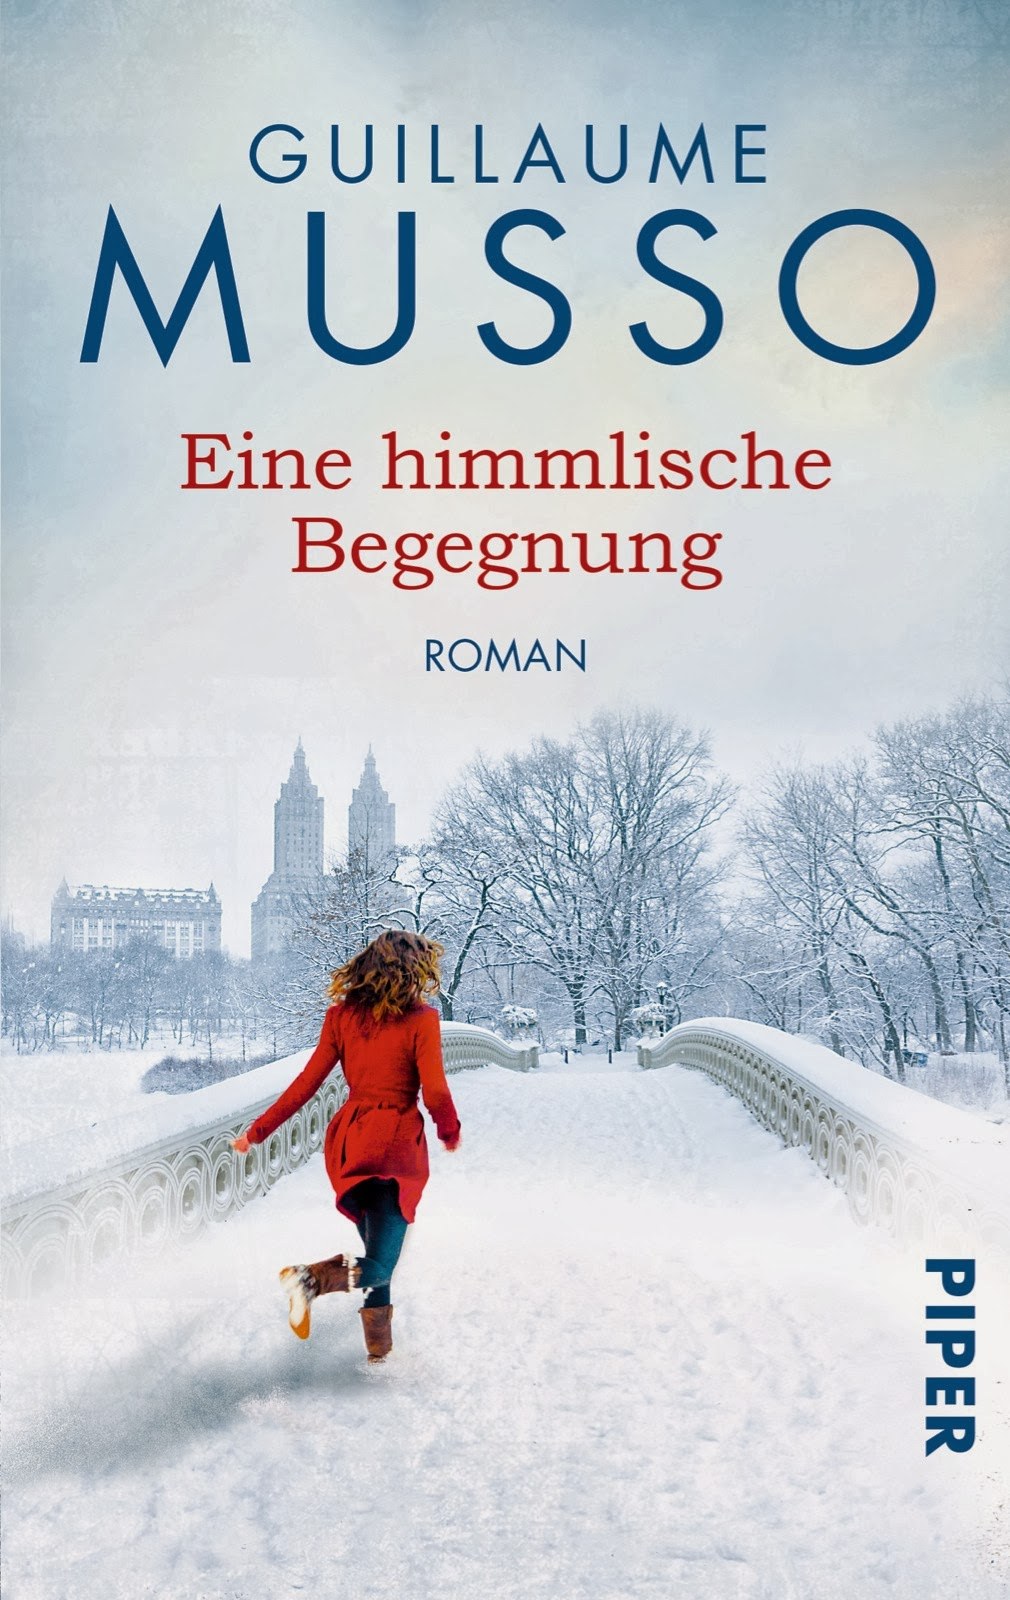 http://www.amazon.de/Eine-himmlische-Begegnung-Guillaume-Musso/dp/3492304907/ref=sr_1_7?s=books&ie=UTF8&qid=1393797630&sr=1-7&keywords=guillaume+Musso